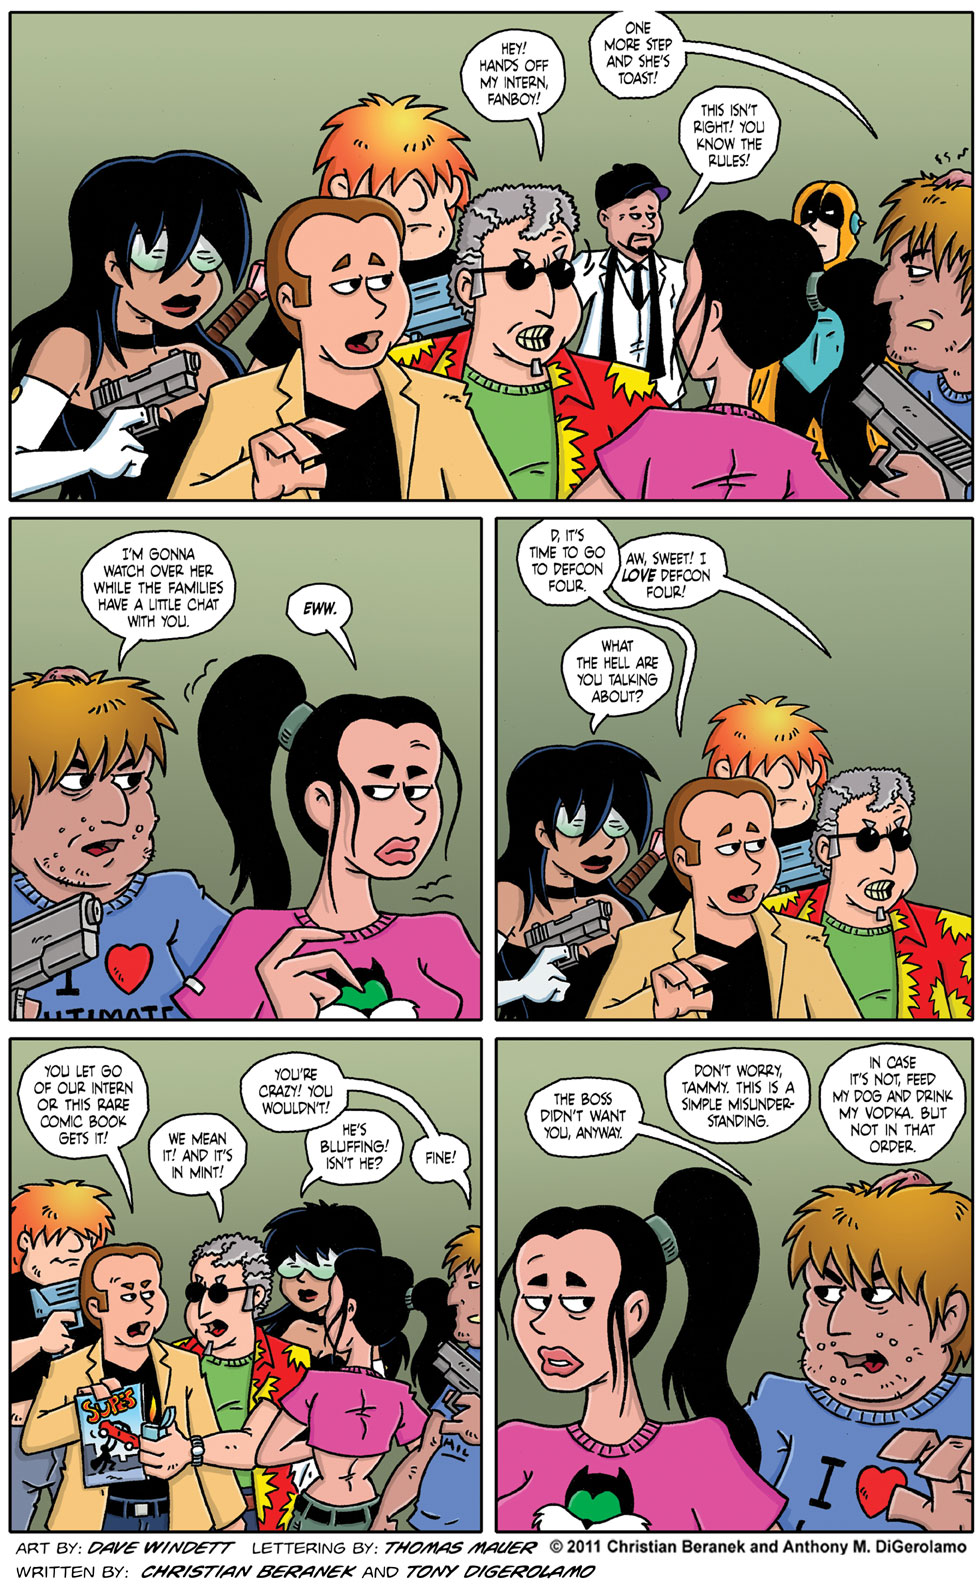 Comic Book Mafia #61: A  Little Chat